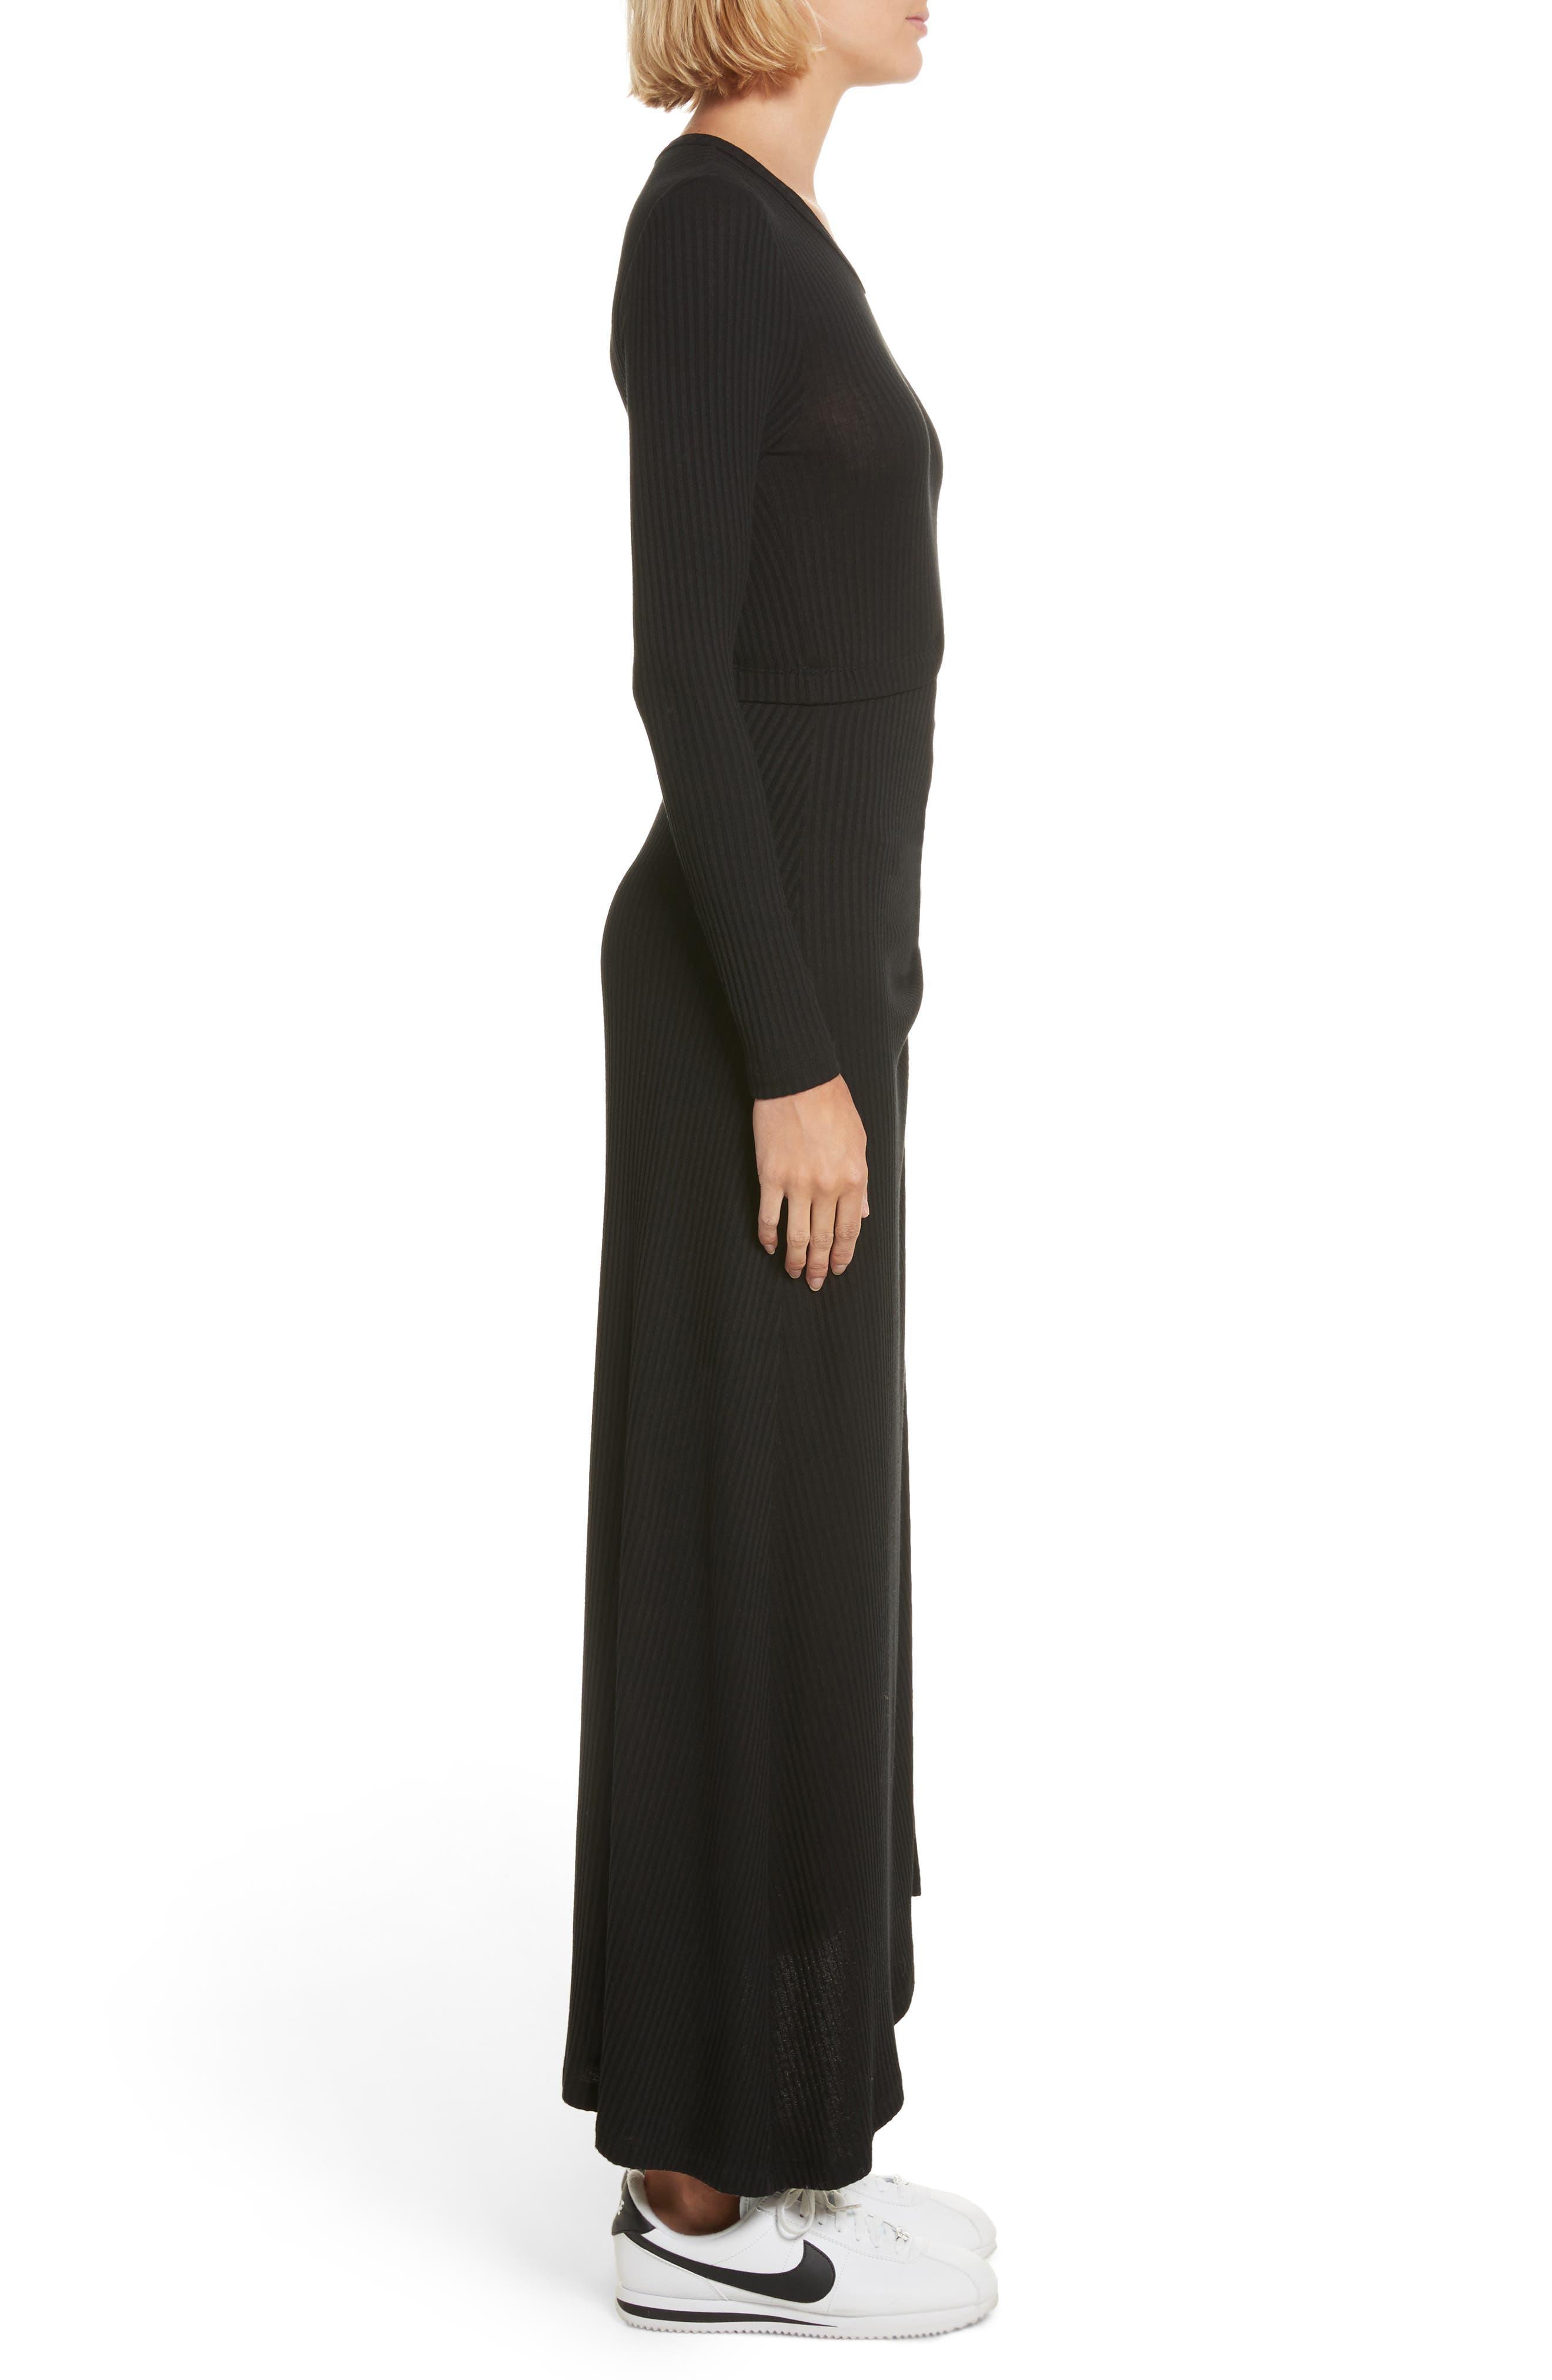 Rooney Cutout Dress,                             Alternate thumbnail 3, color,                             Black